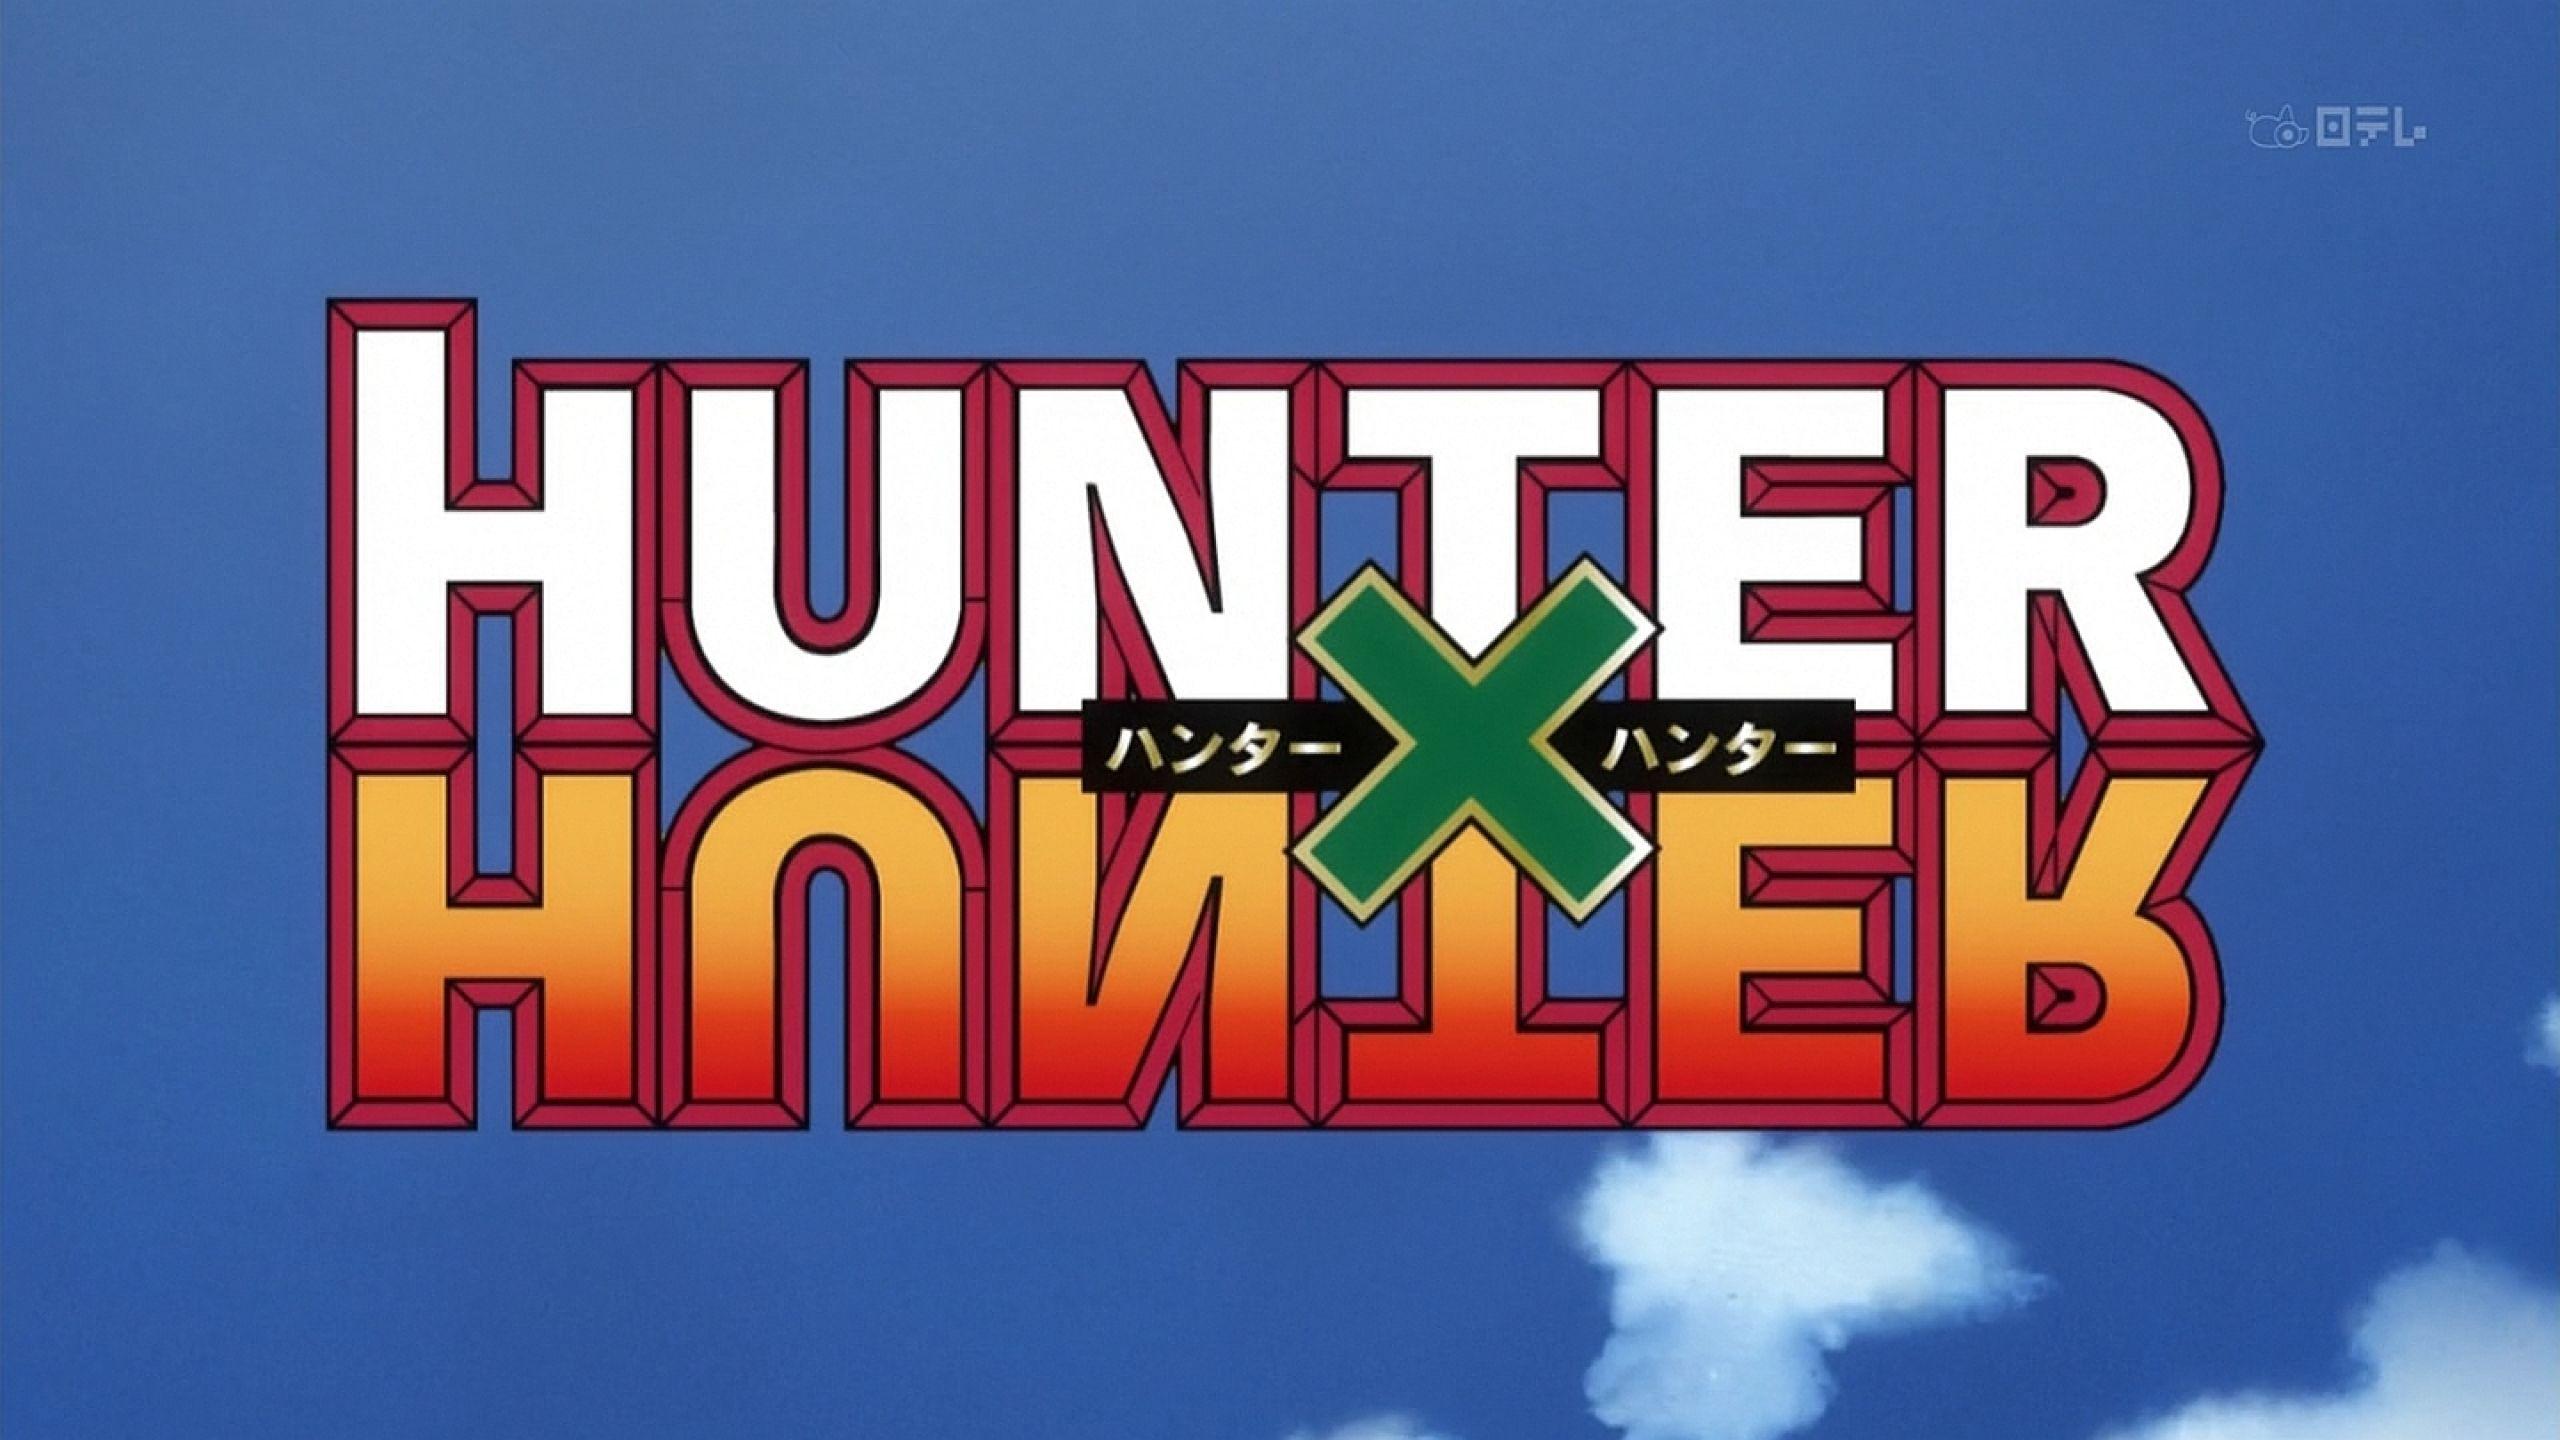 Download wallpapers download 2560x1440 hunter x hunter manga download wallpapers download 2560x1440 hunter x hunter manga voltagebd Gallery